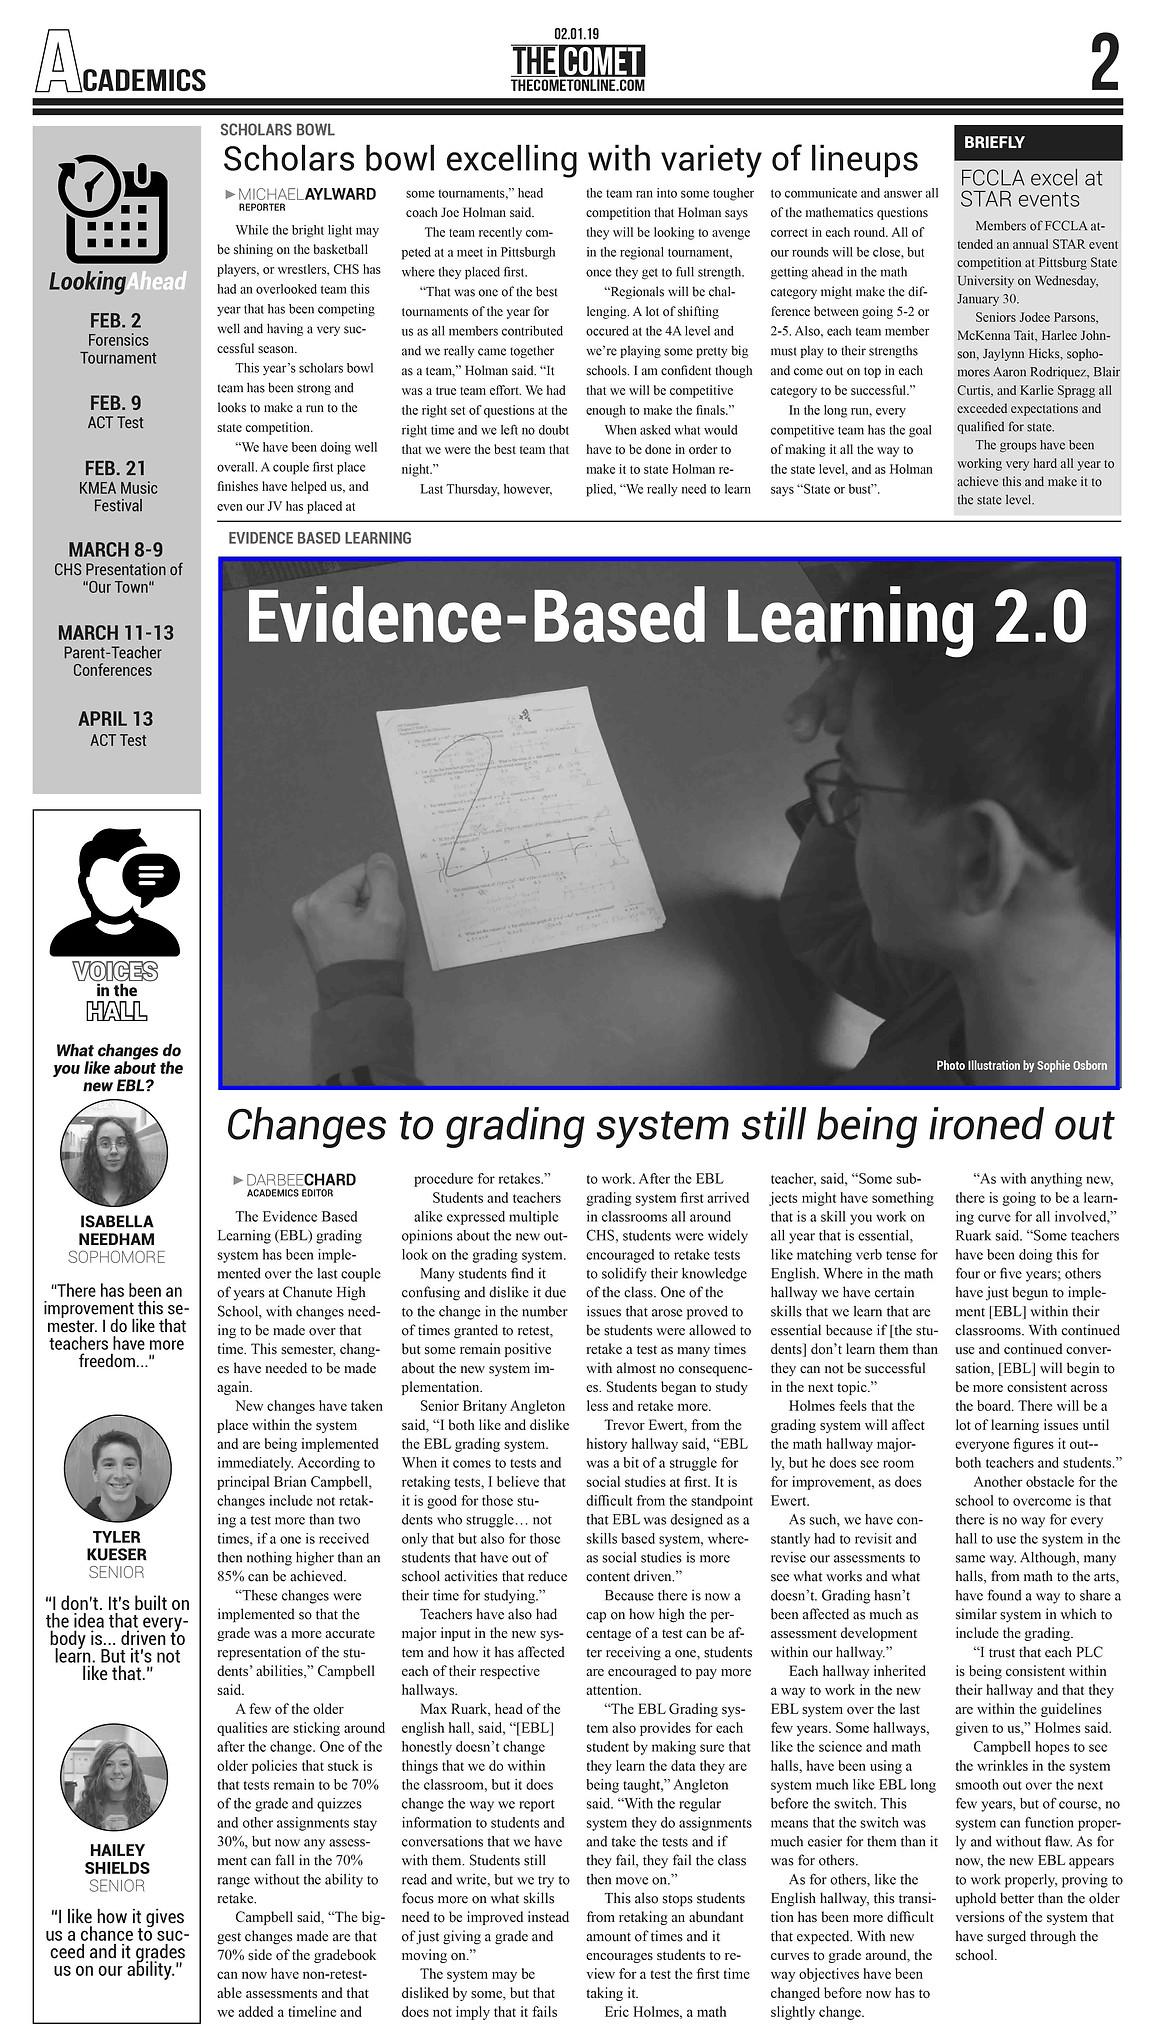 2-1-2019 Page 2-JPEG.jpg